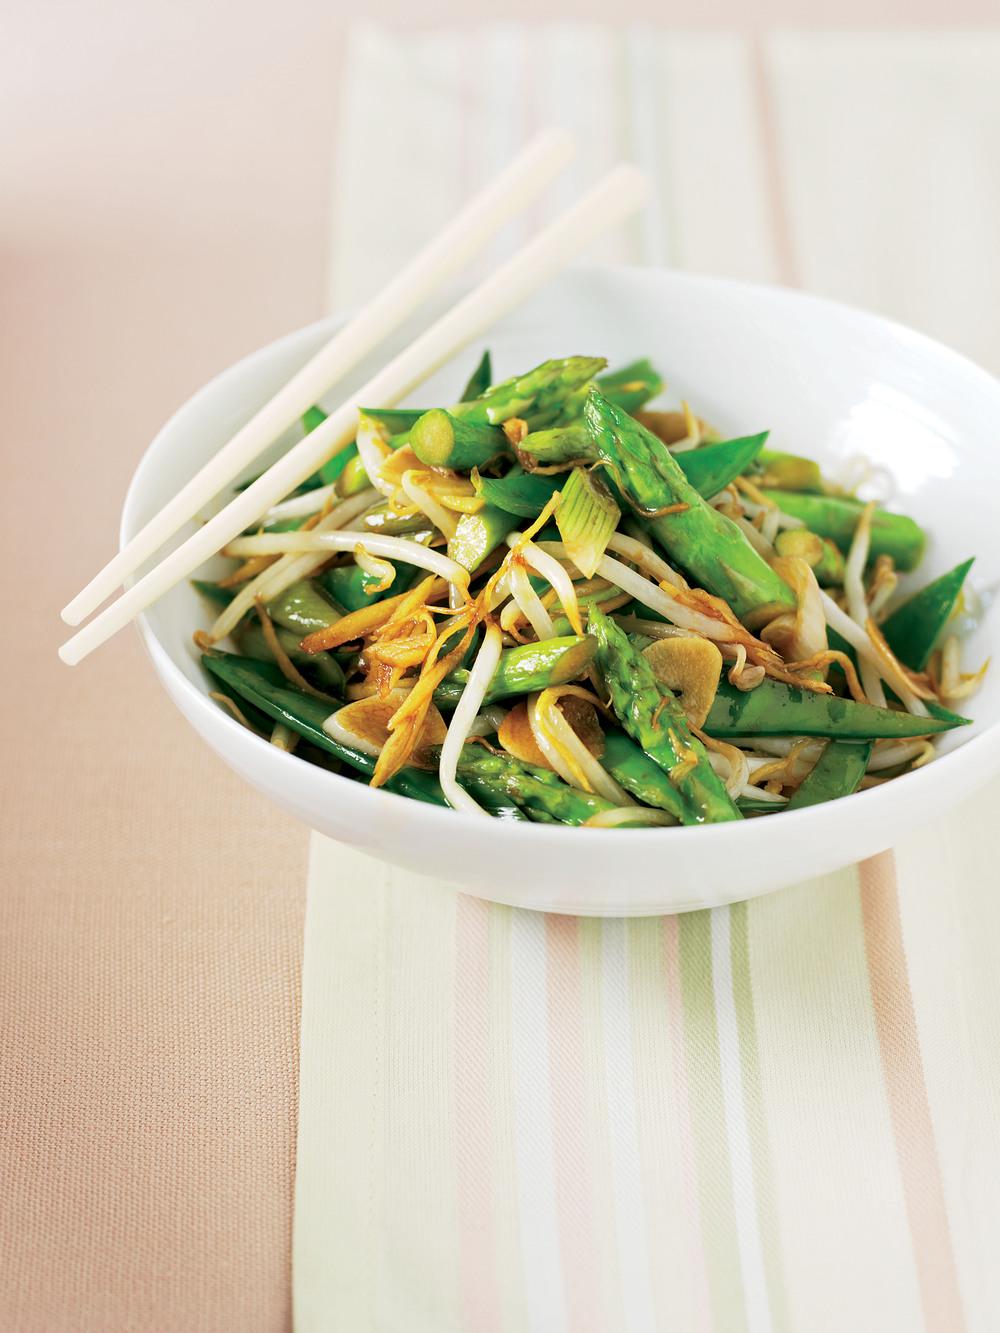 Asparagus & Mangetout Stir-Fry